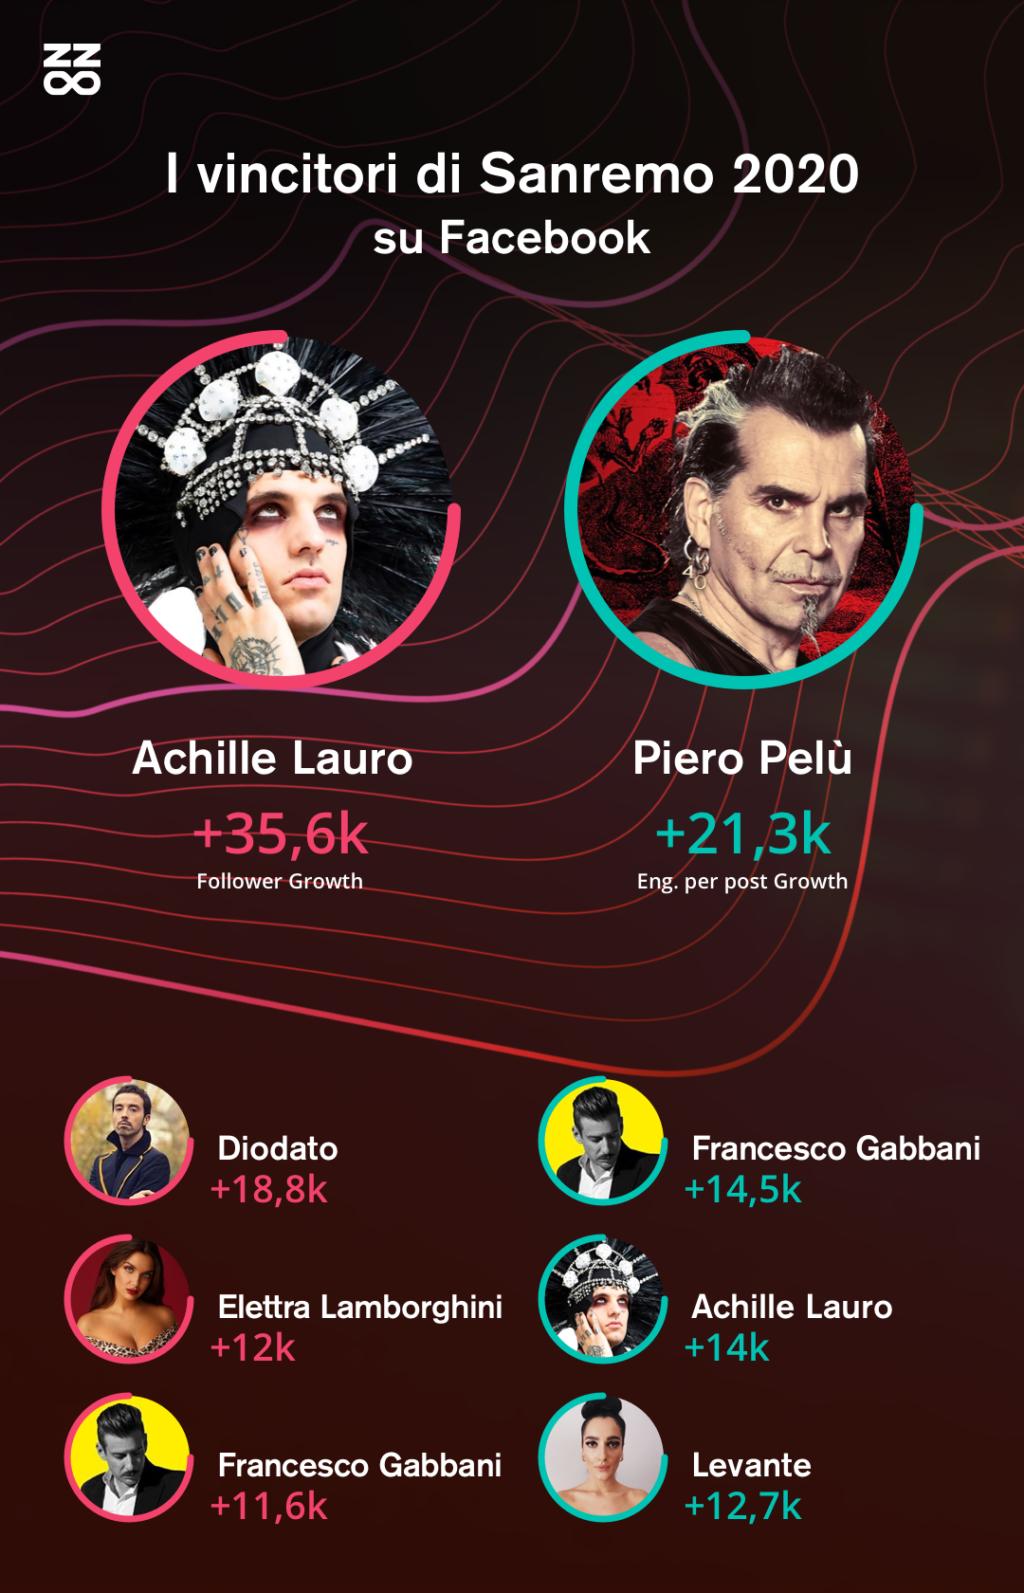 Sanremo vincitori Facebook